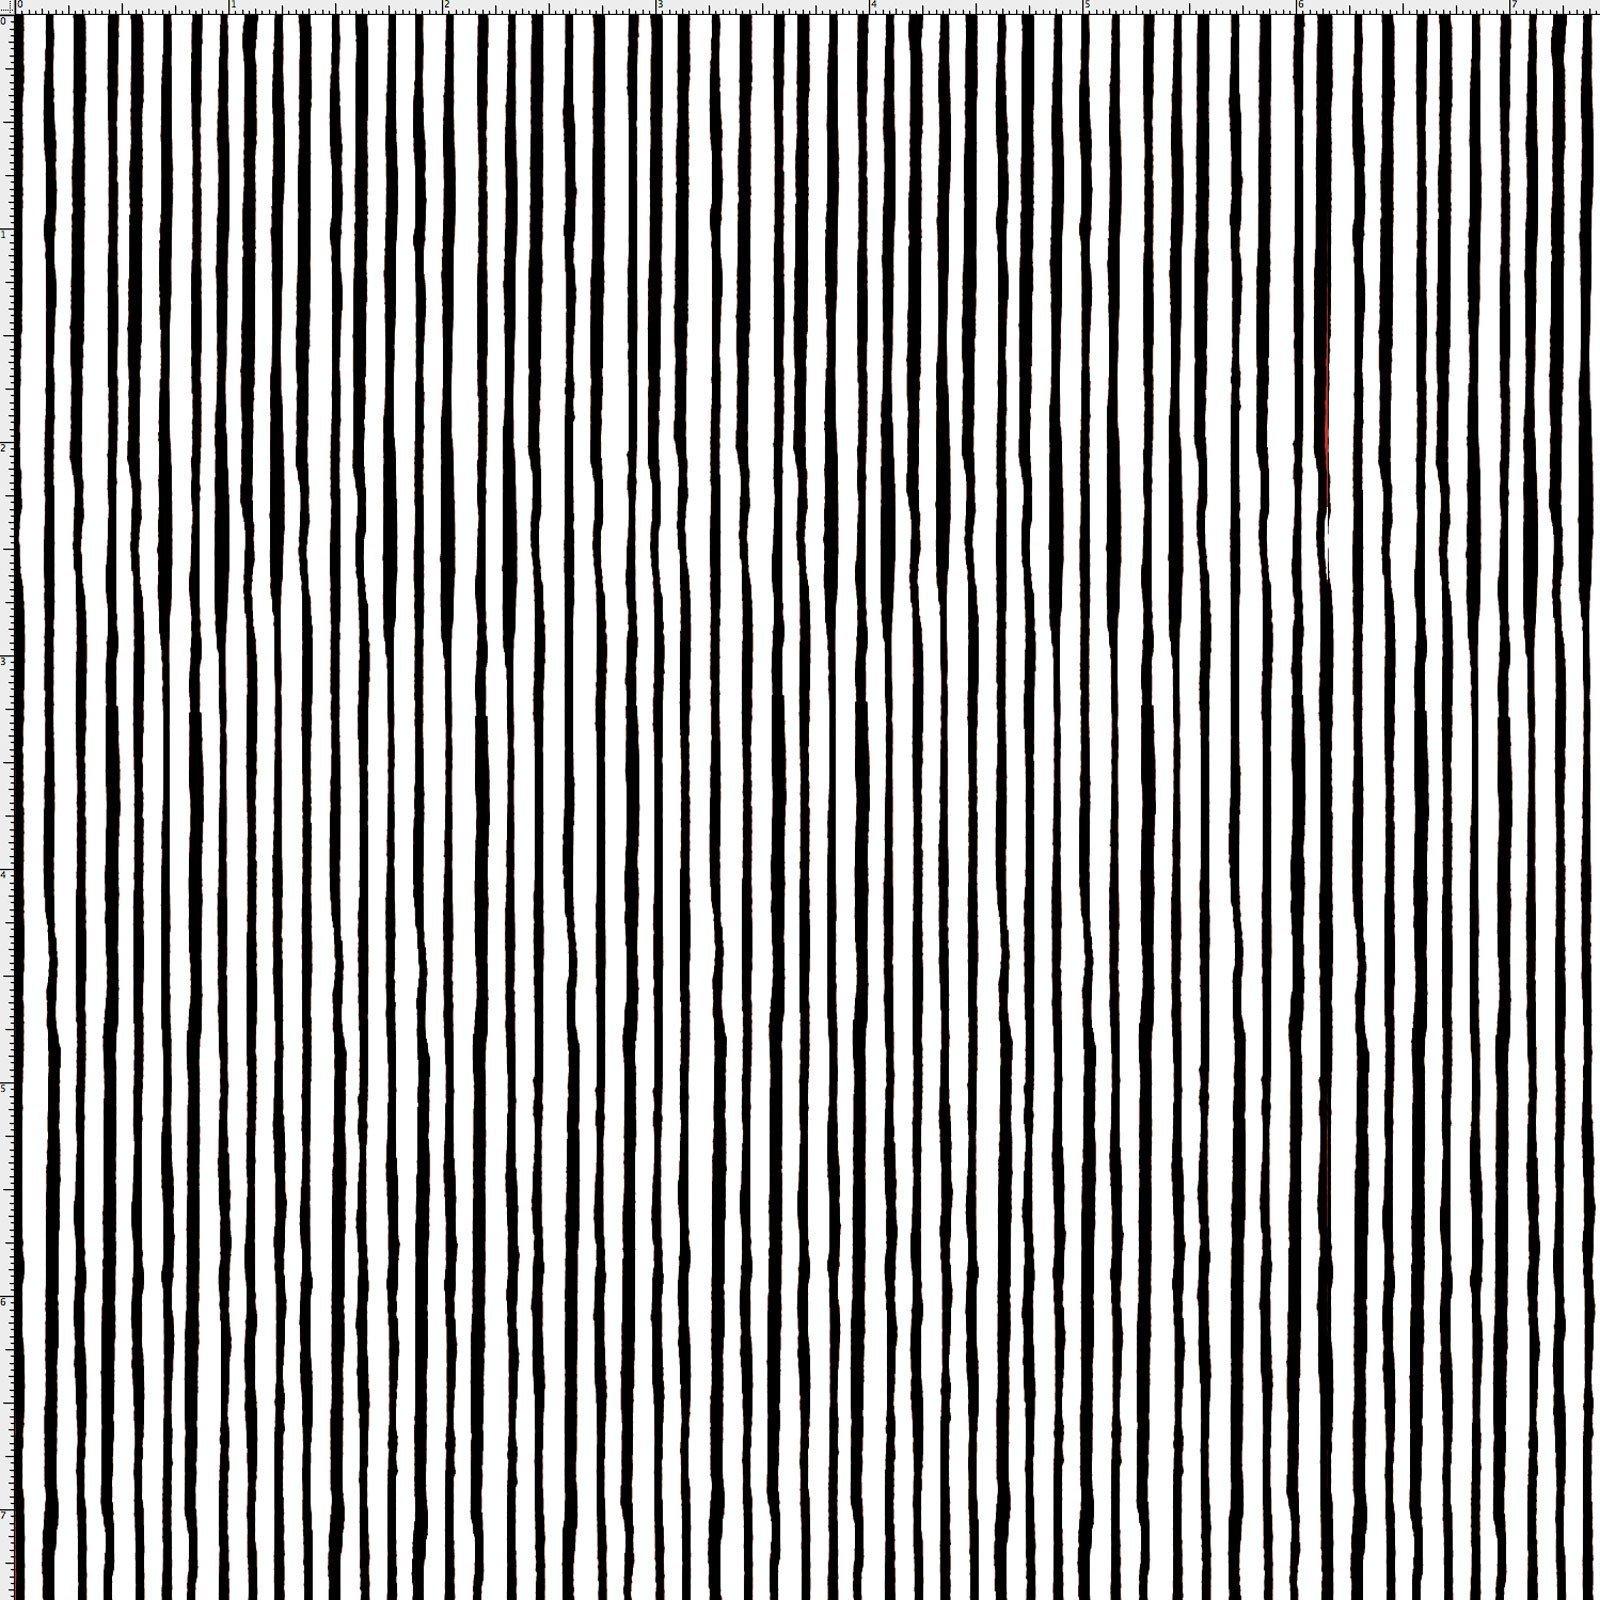 Quirky Pin Stripe White/Black 691-819